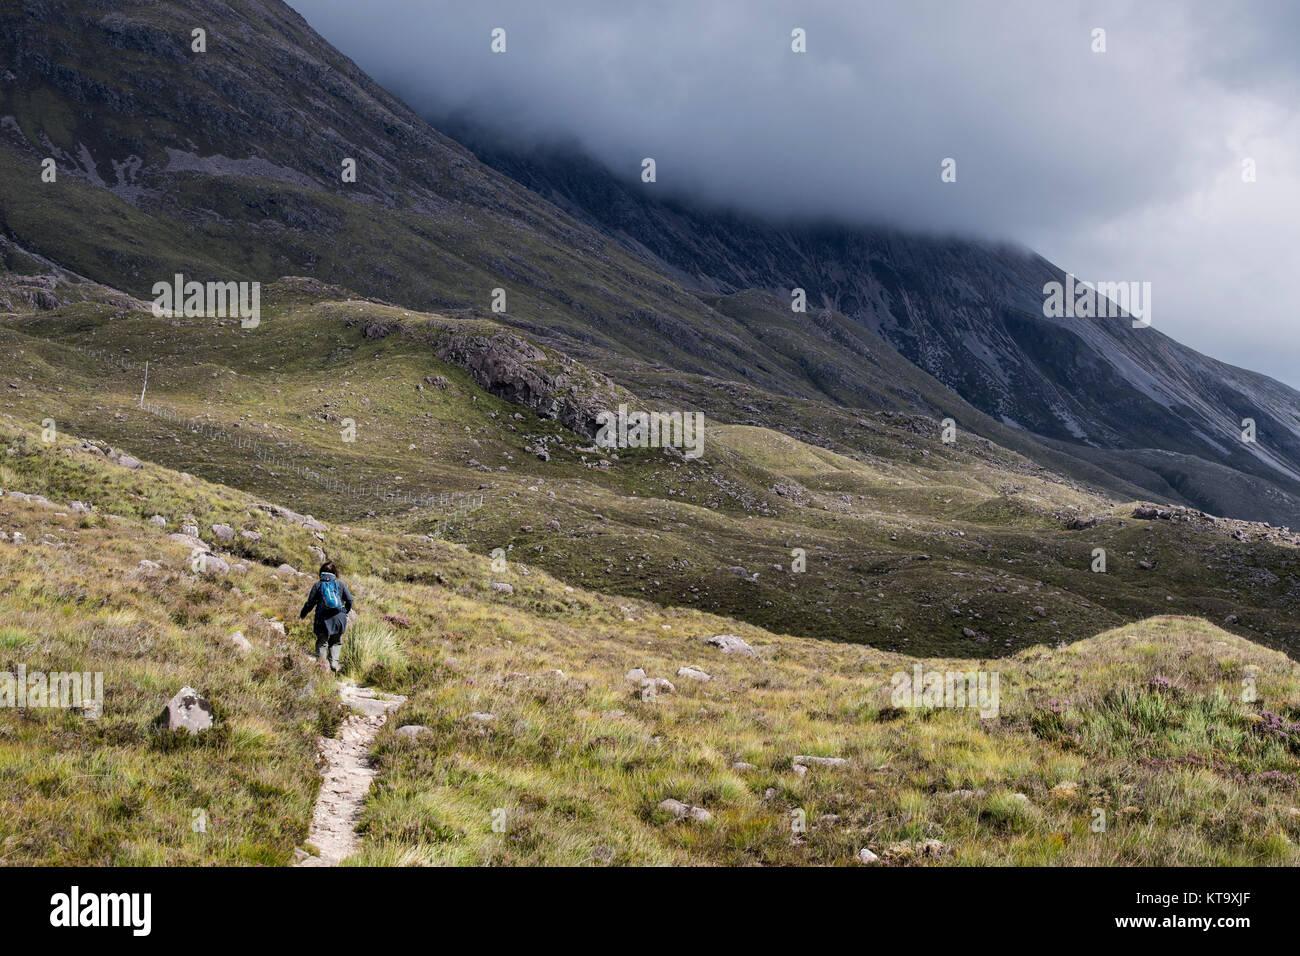 Female hiker in the Torridon hills, Wester Ross, Scotland - Stock Image